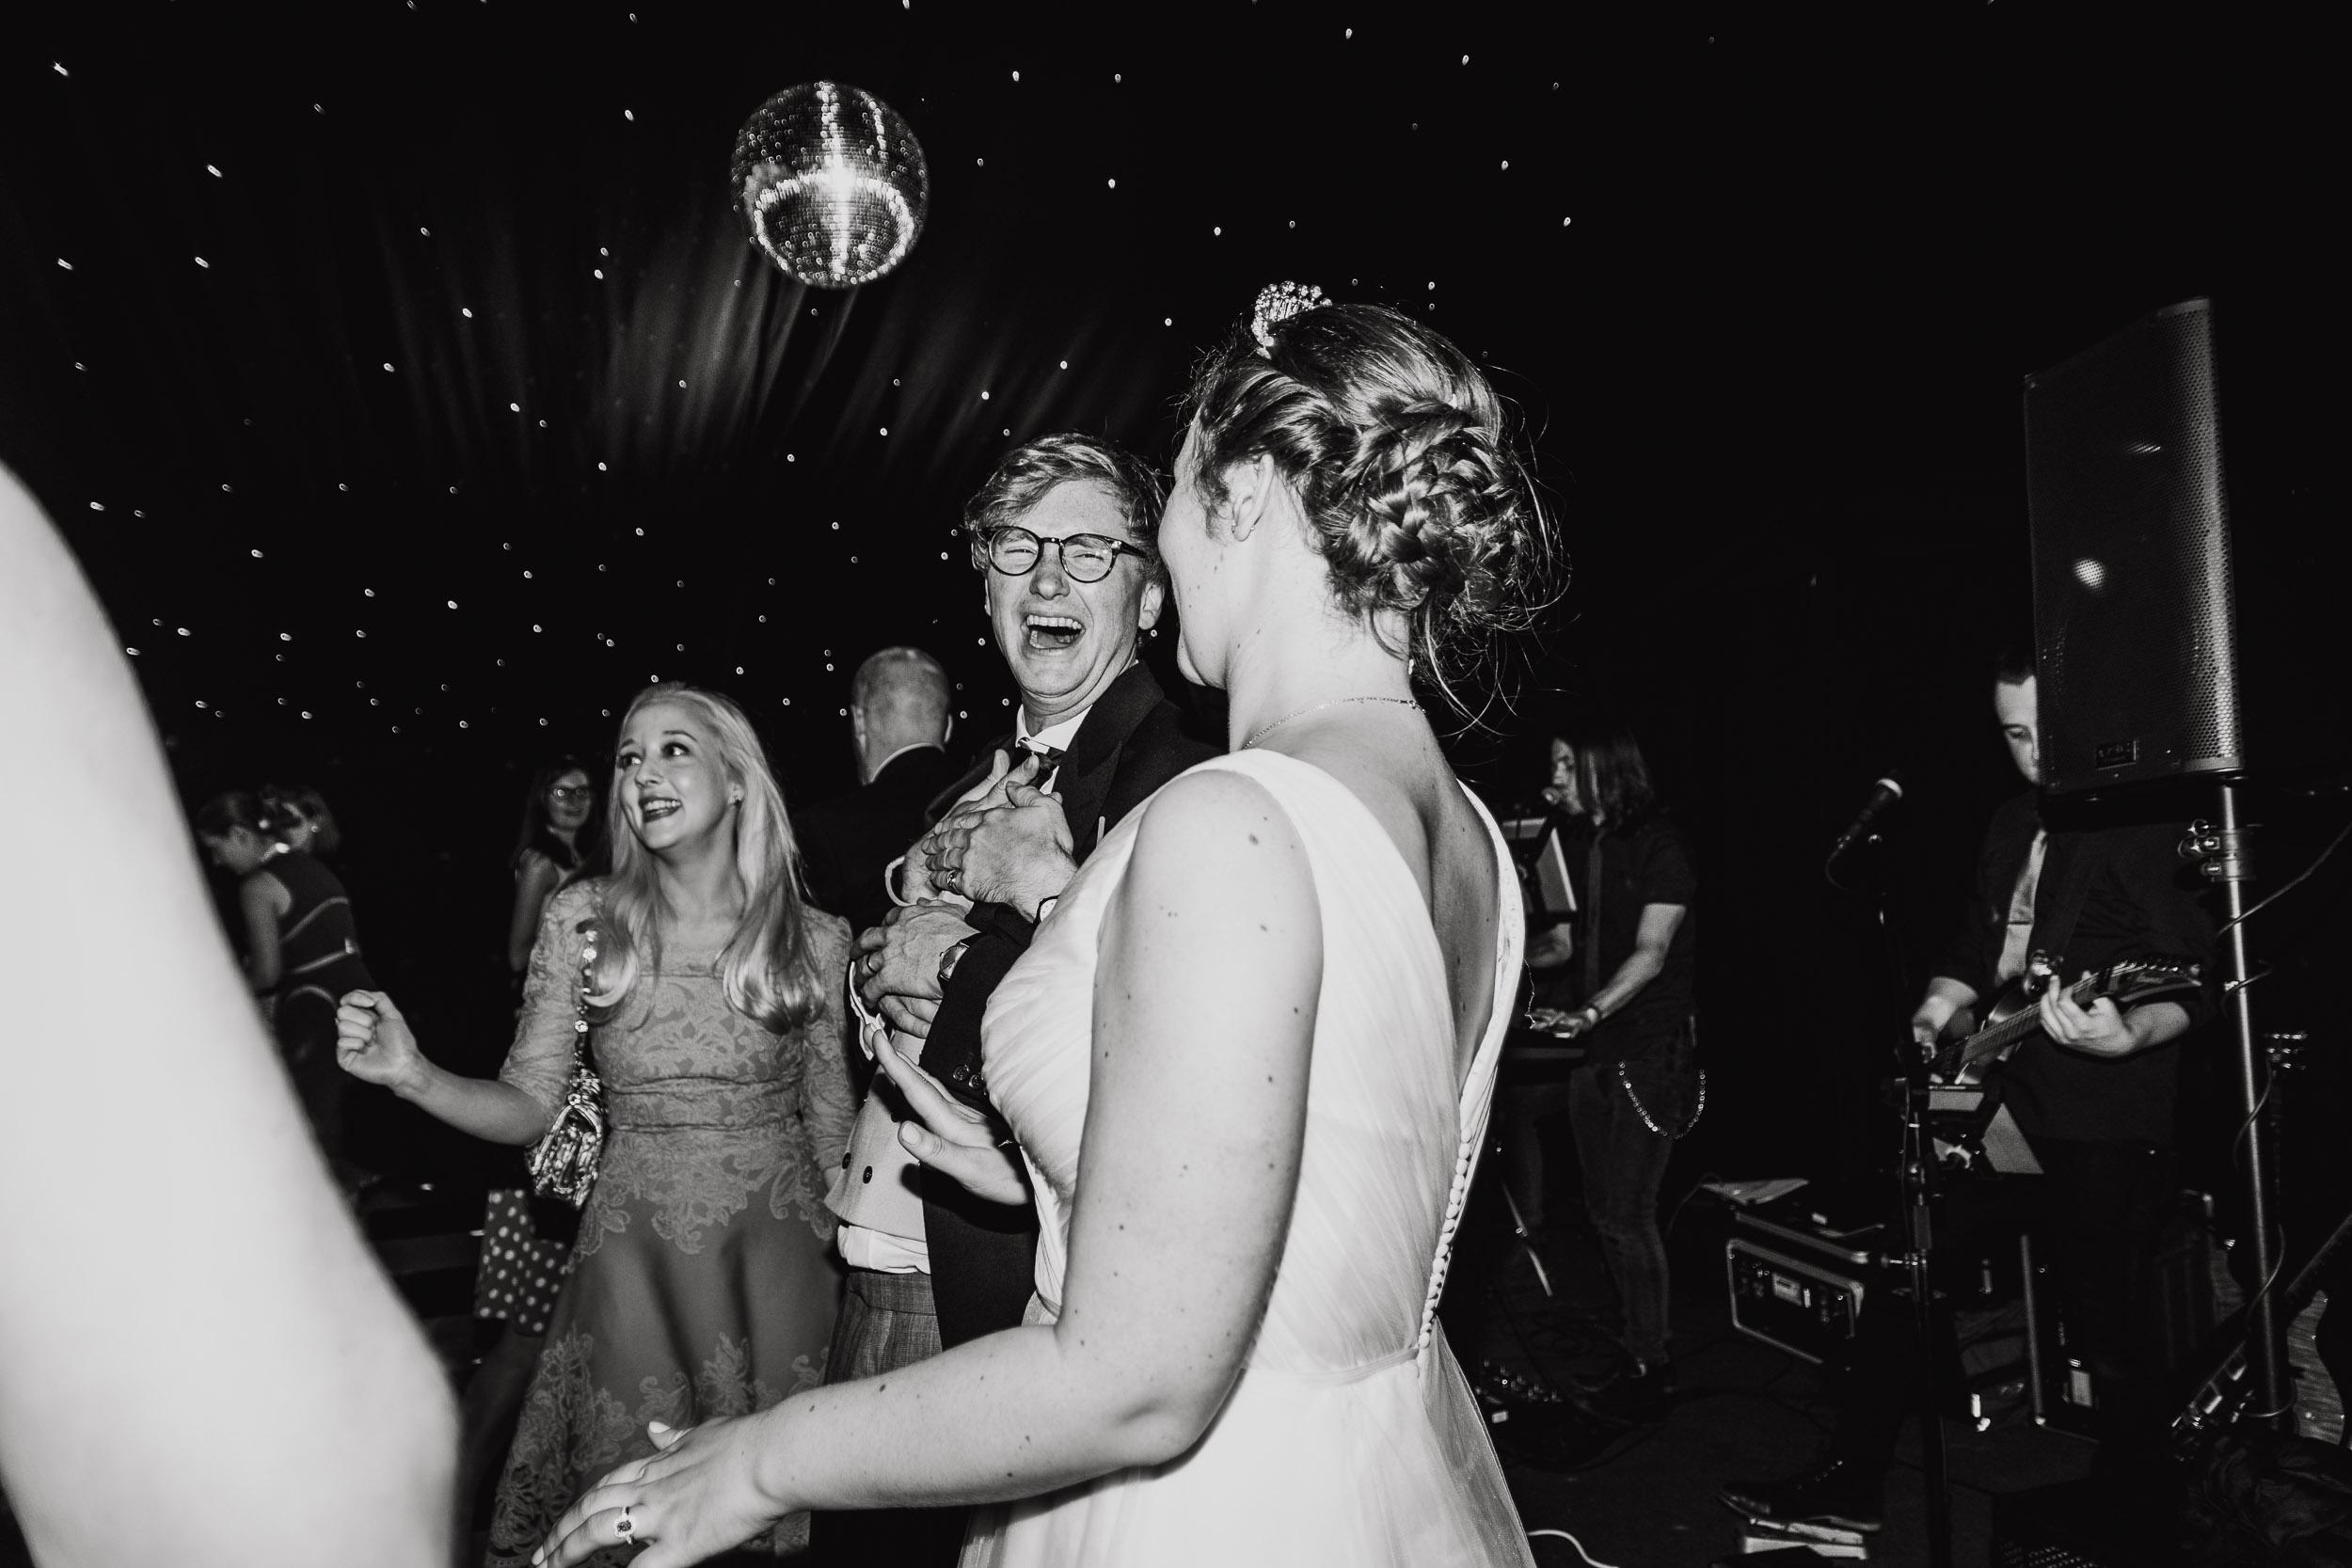 hamswell-house-wedding-photographer-w122.jpg